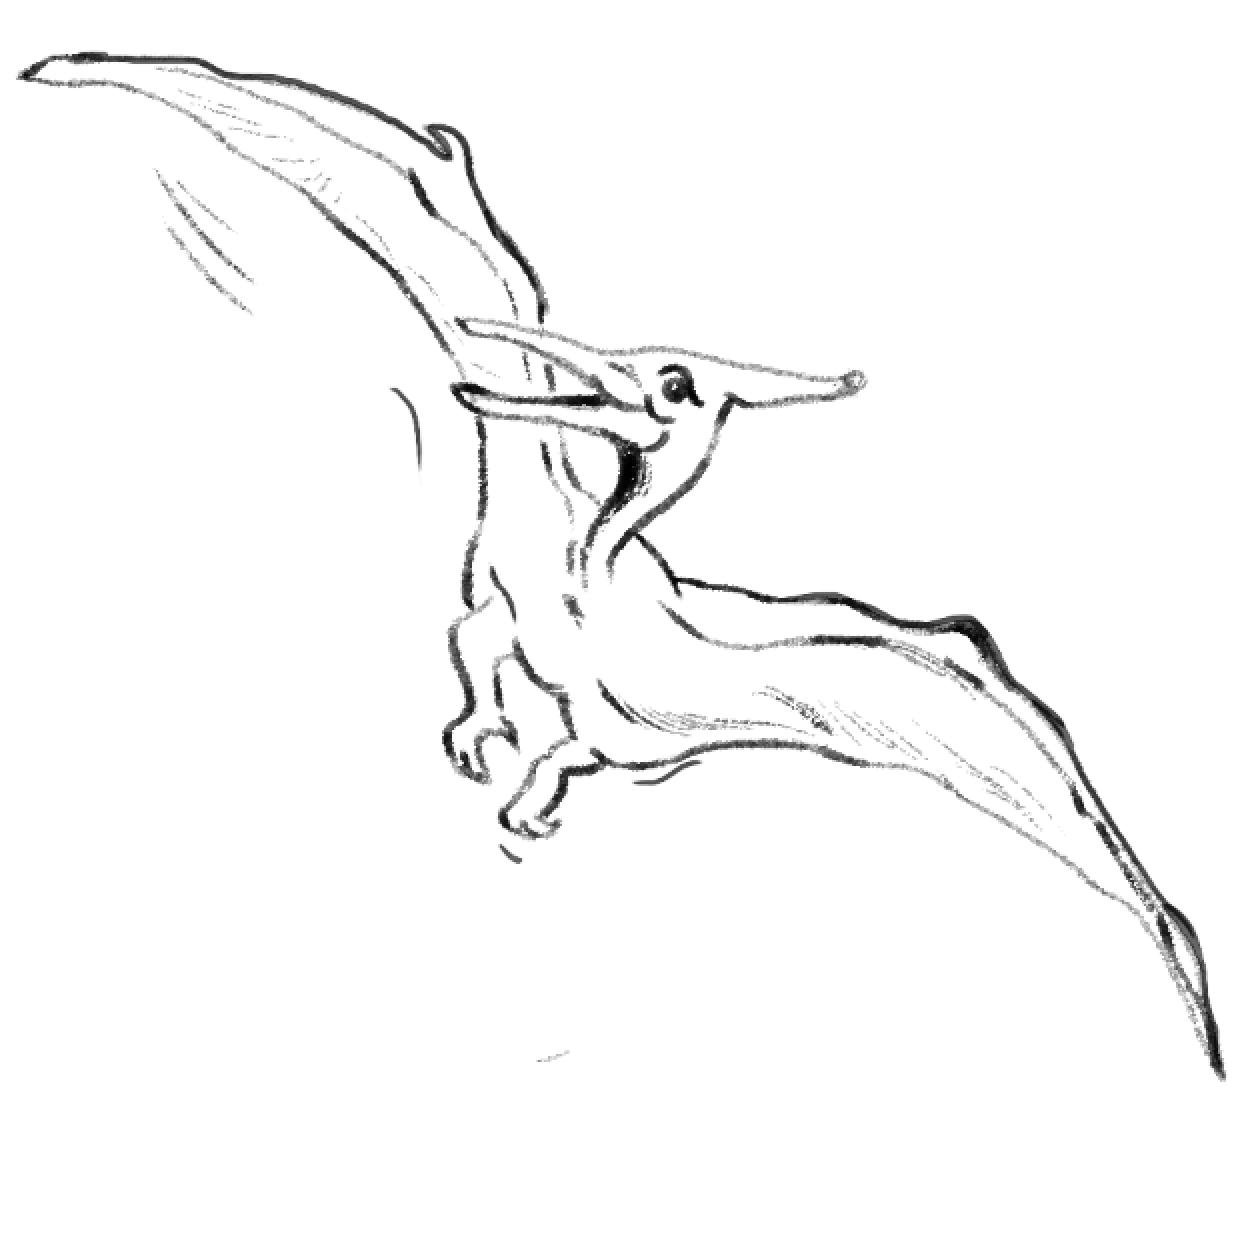 pterodactyl_sketch_vesidashinova